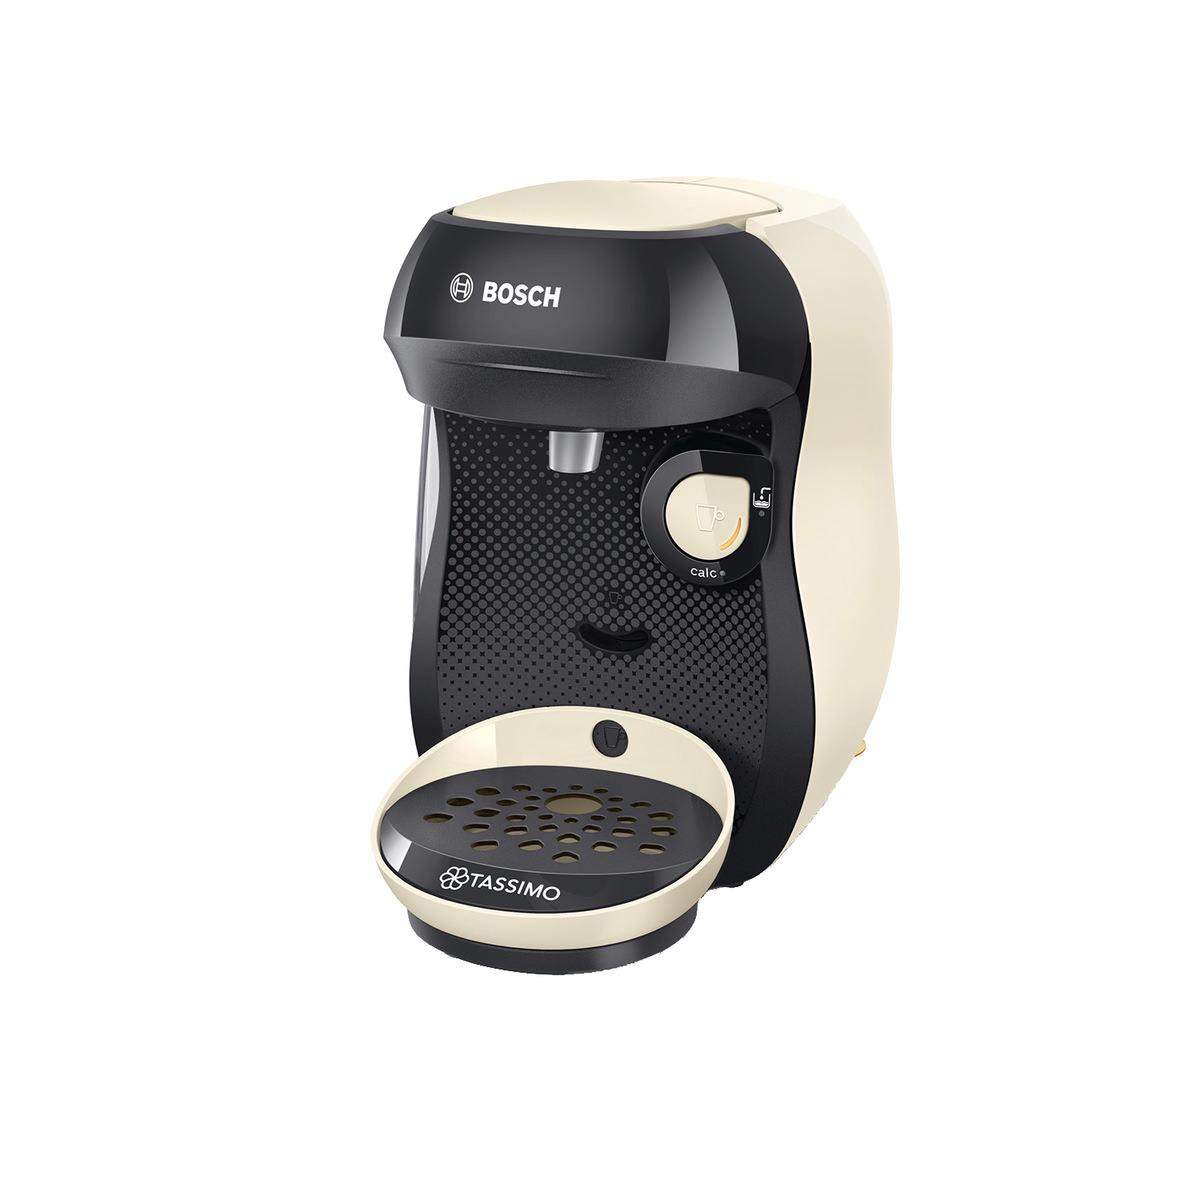 bosch tassimo kaffeeautomat tas1007 in creme jetzt im kodi. Black Bedroom Furniture Sets. Home Design Ideas